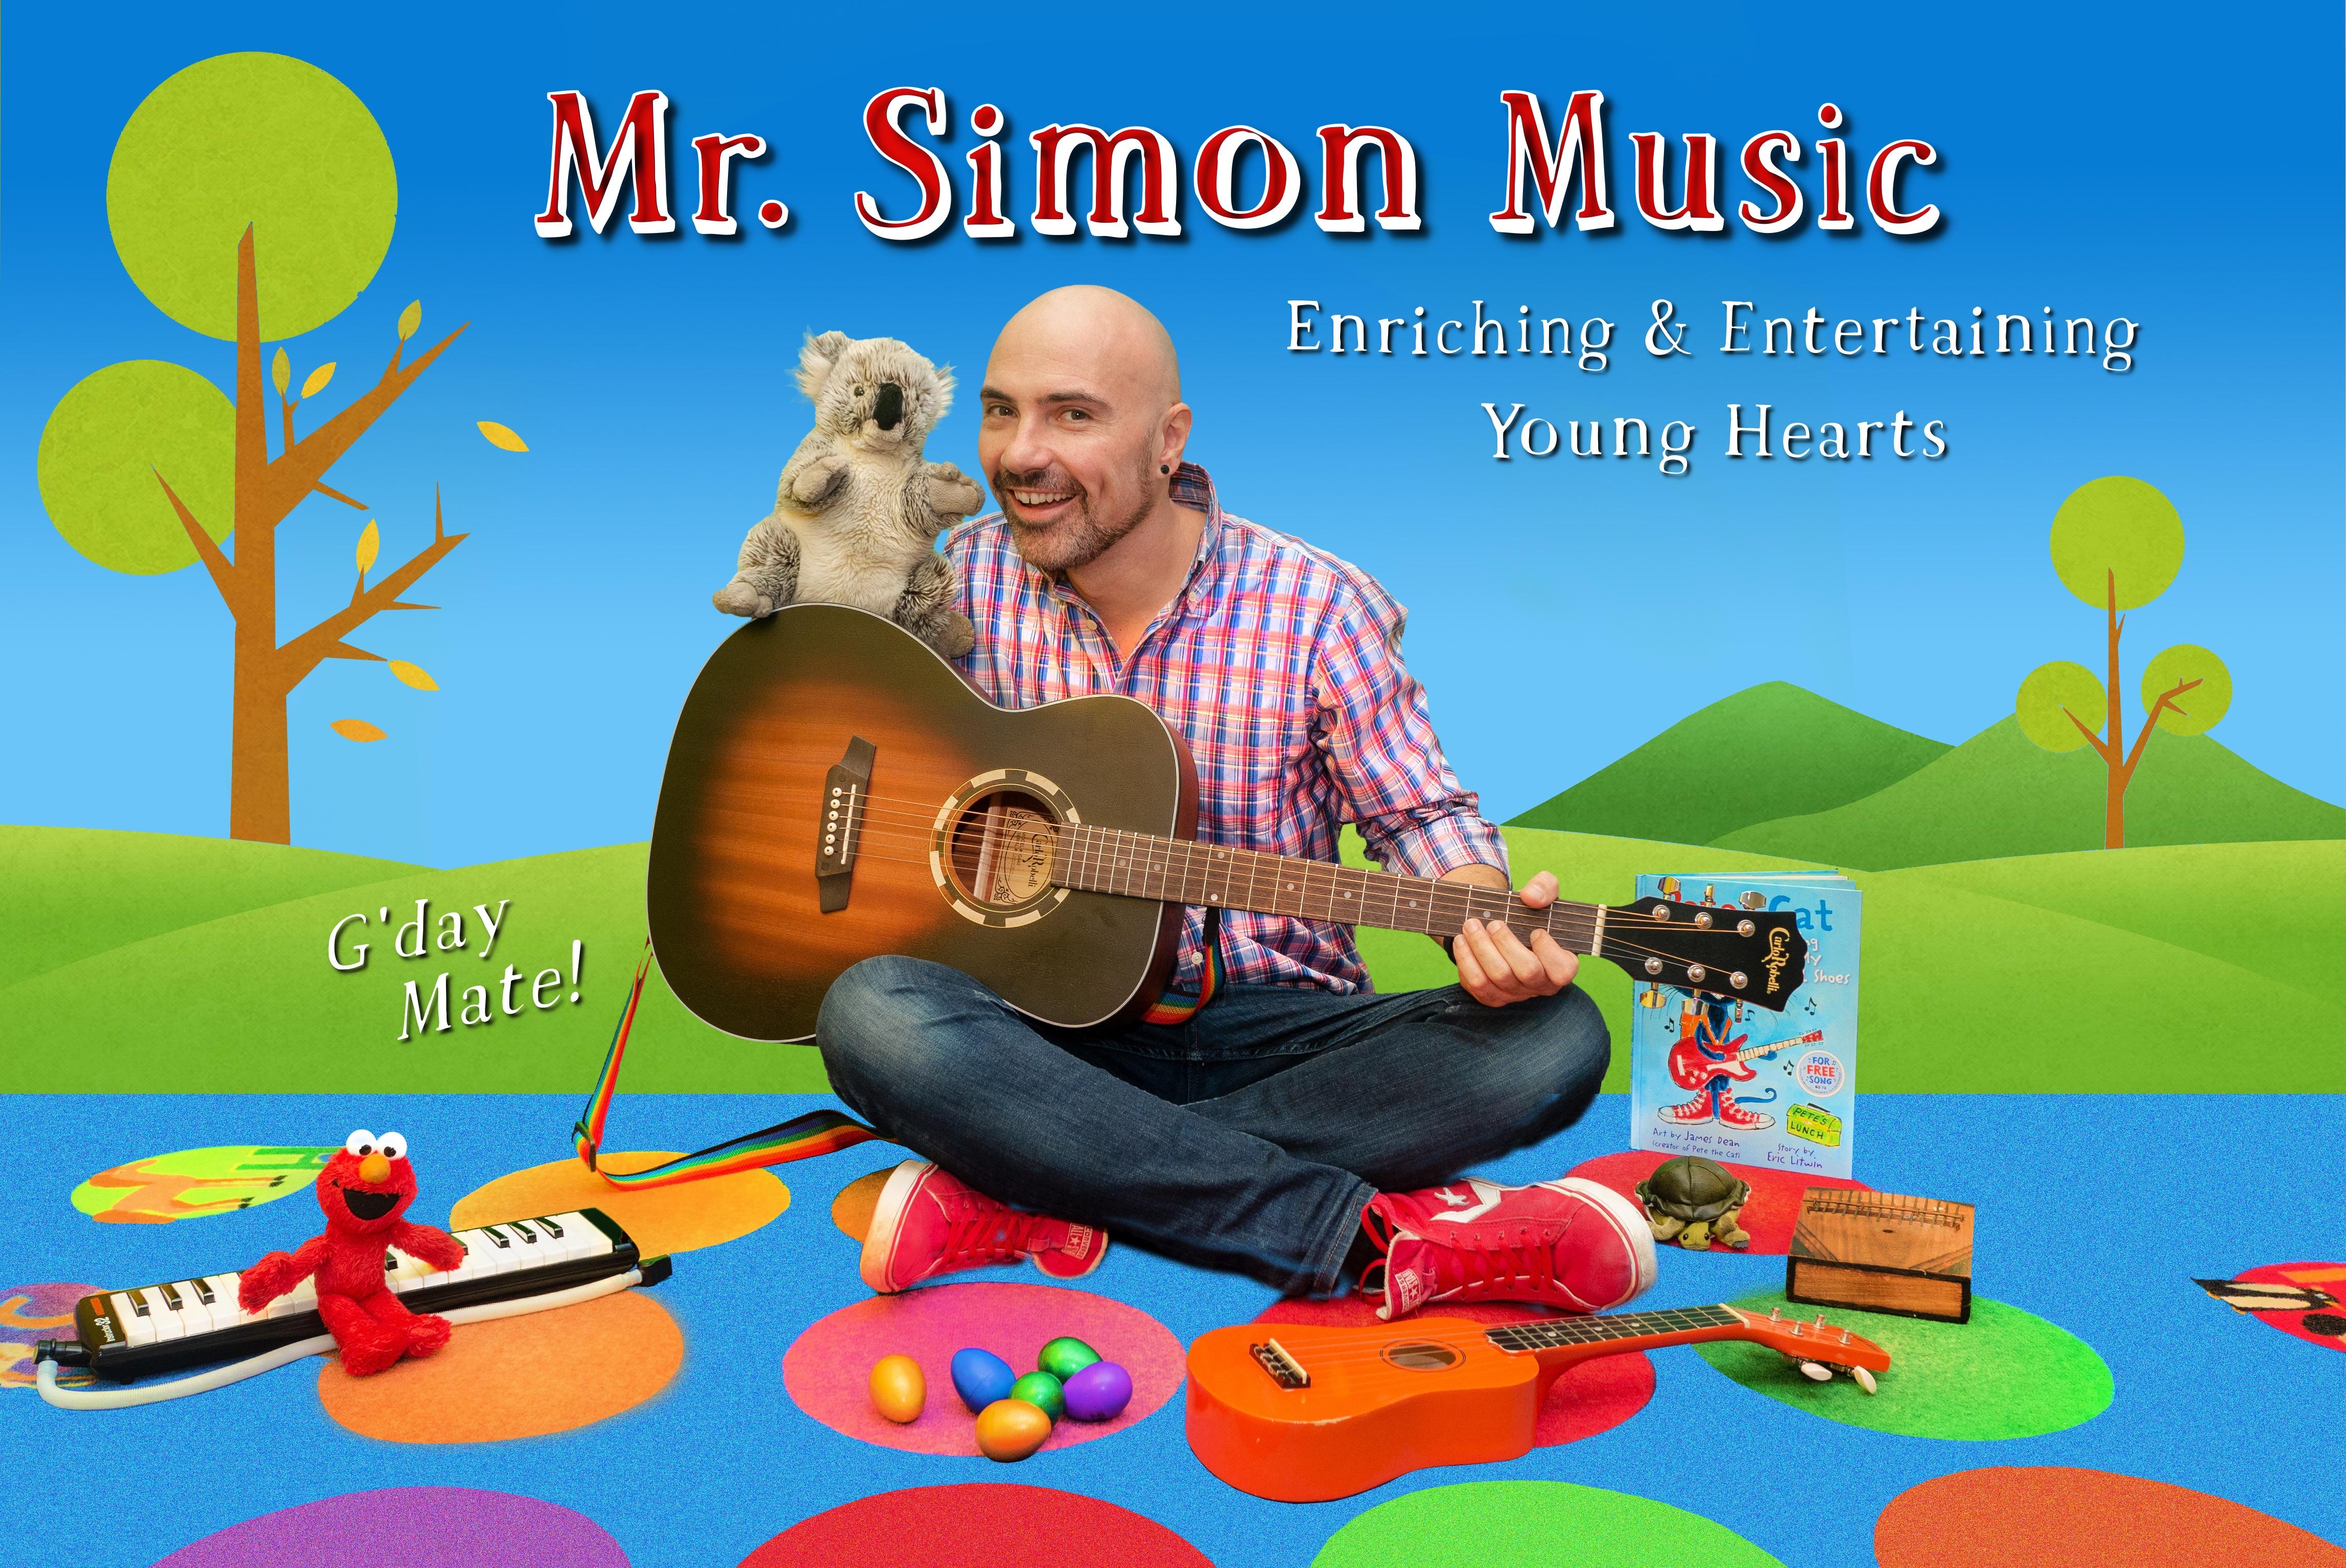 Mr. Simon Music POSTCARD FRONT